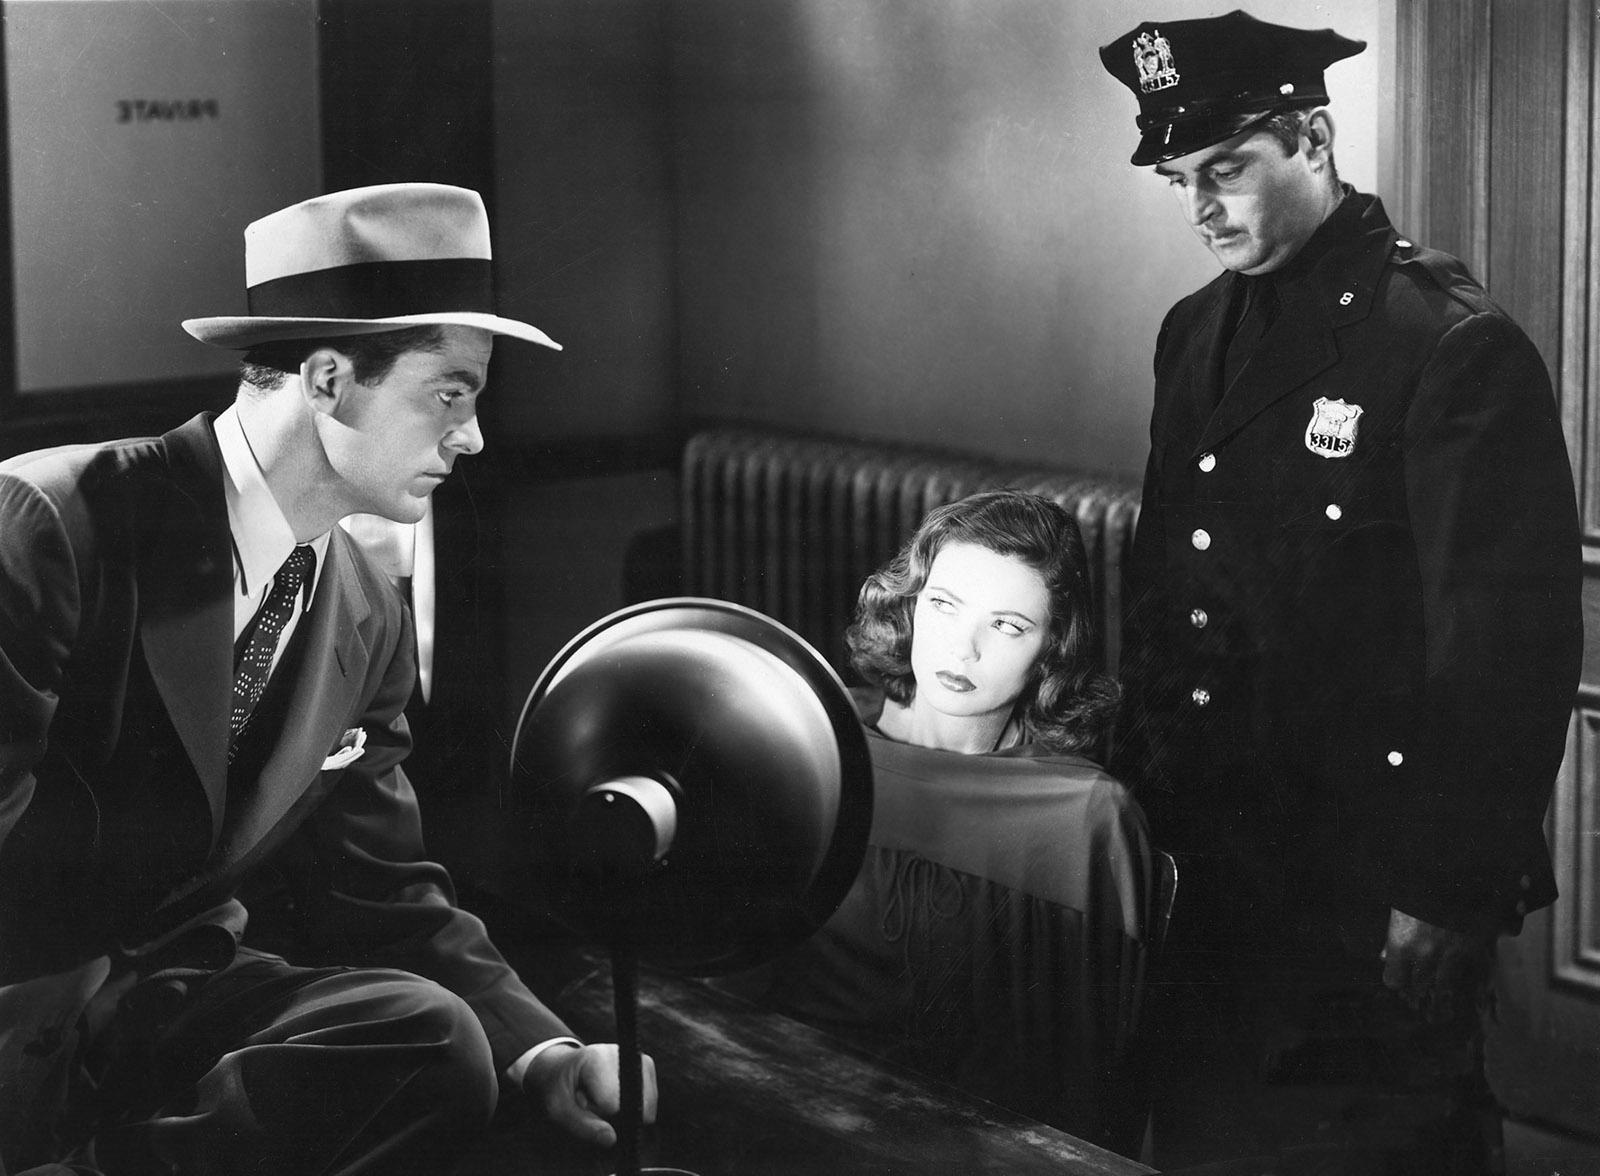 Dana Andrews and Gene Tierney in Laura, 1944